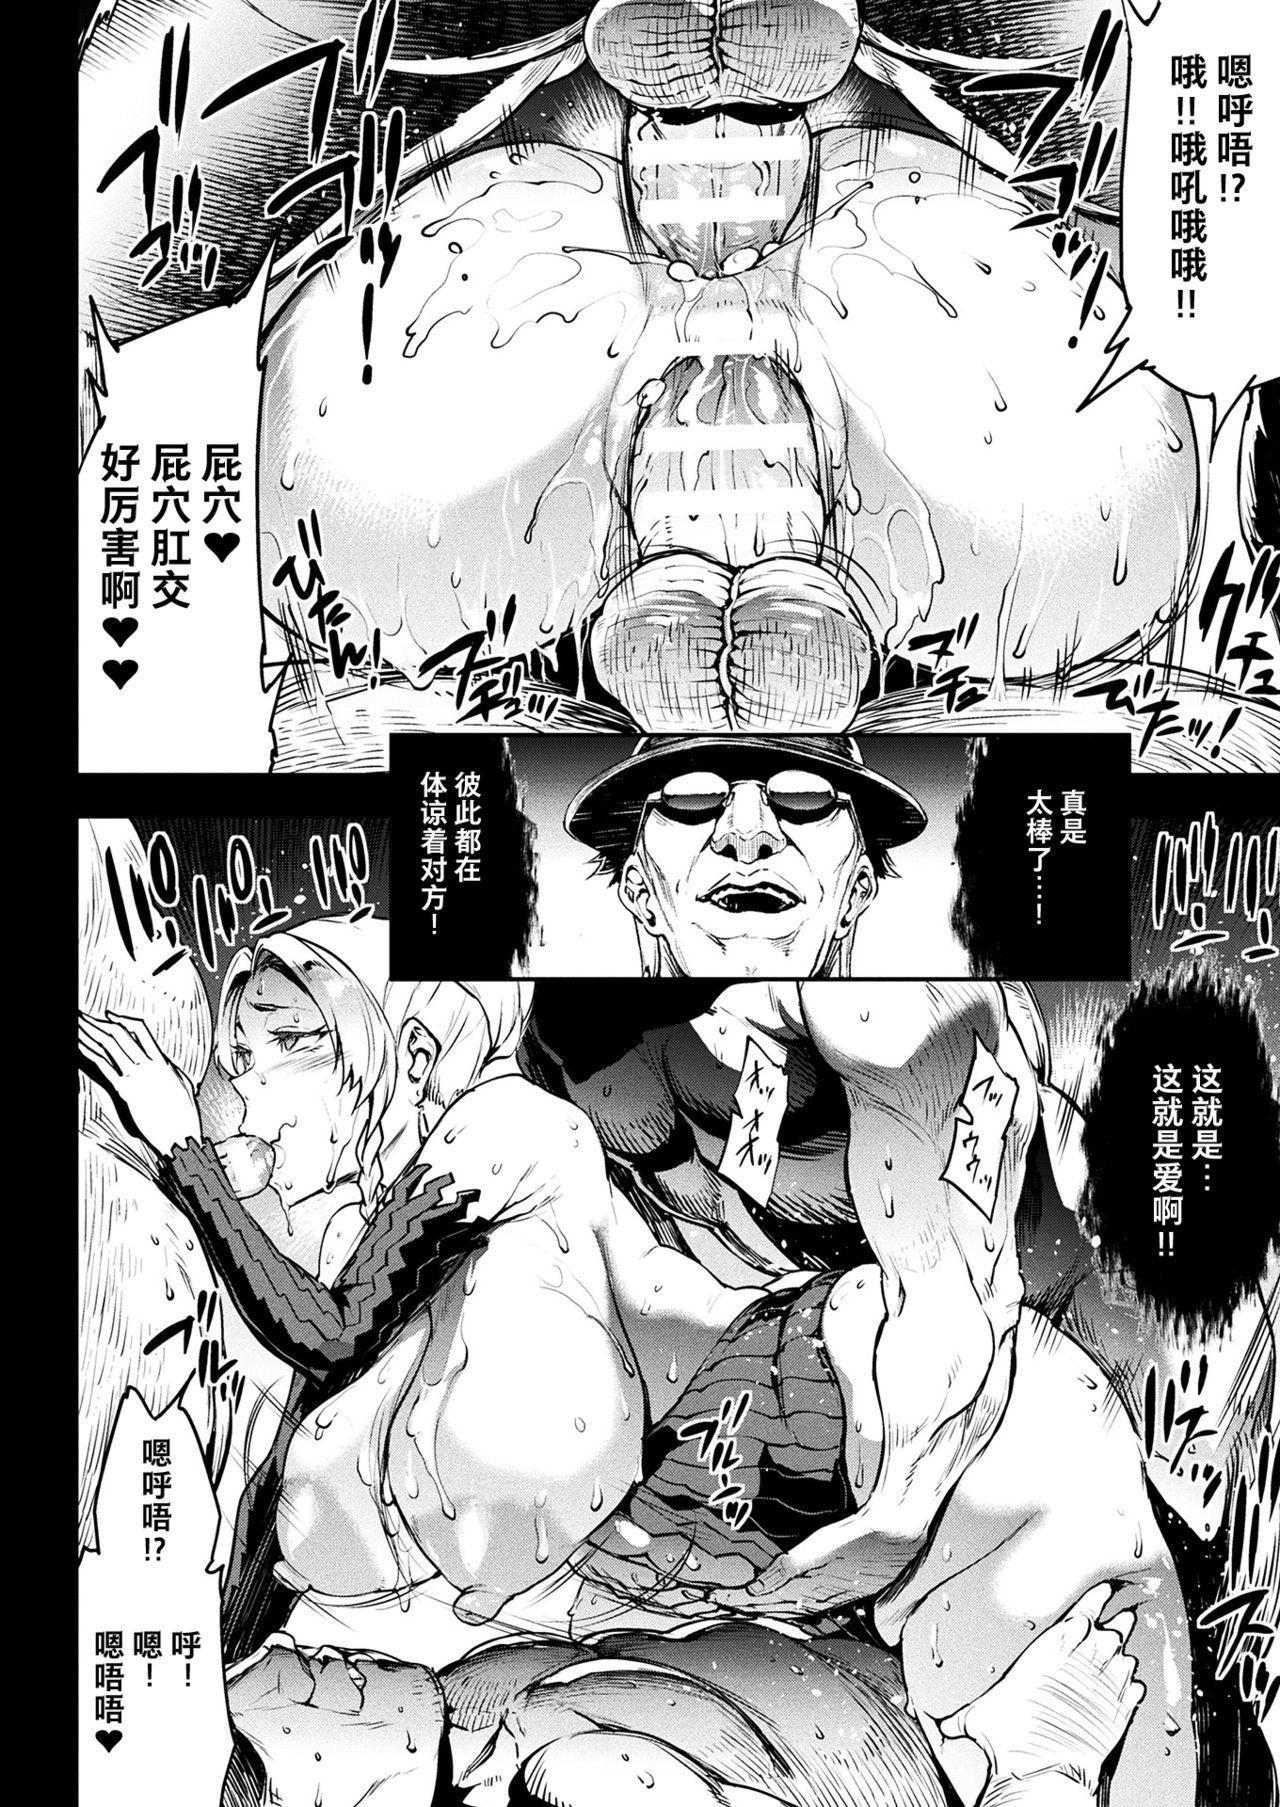 [Erect Sawaru] Raikou Shinki Igis Magia -PANDRA saga 3rd ignition- Ch. 24 (COMIC Unreal 2020-08 Vol. 86) [Chinese] [不咕鸟汉化组] [Digital] 17